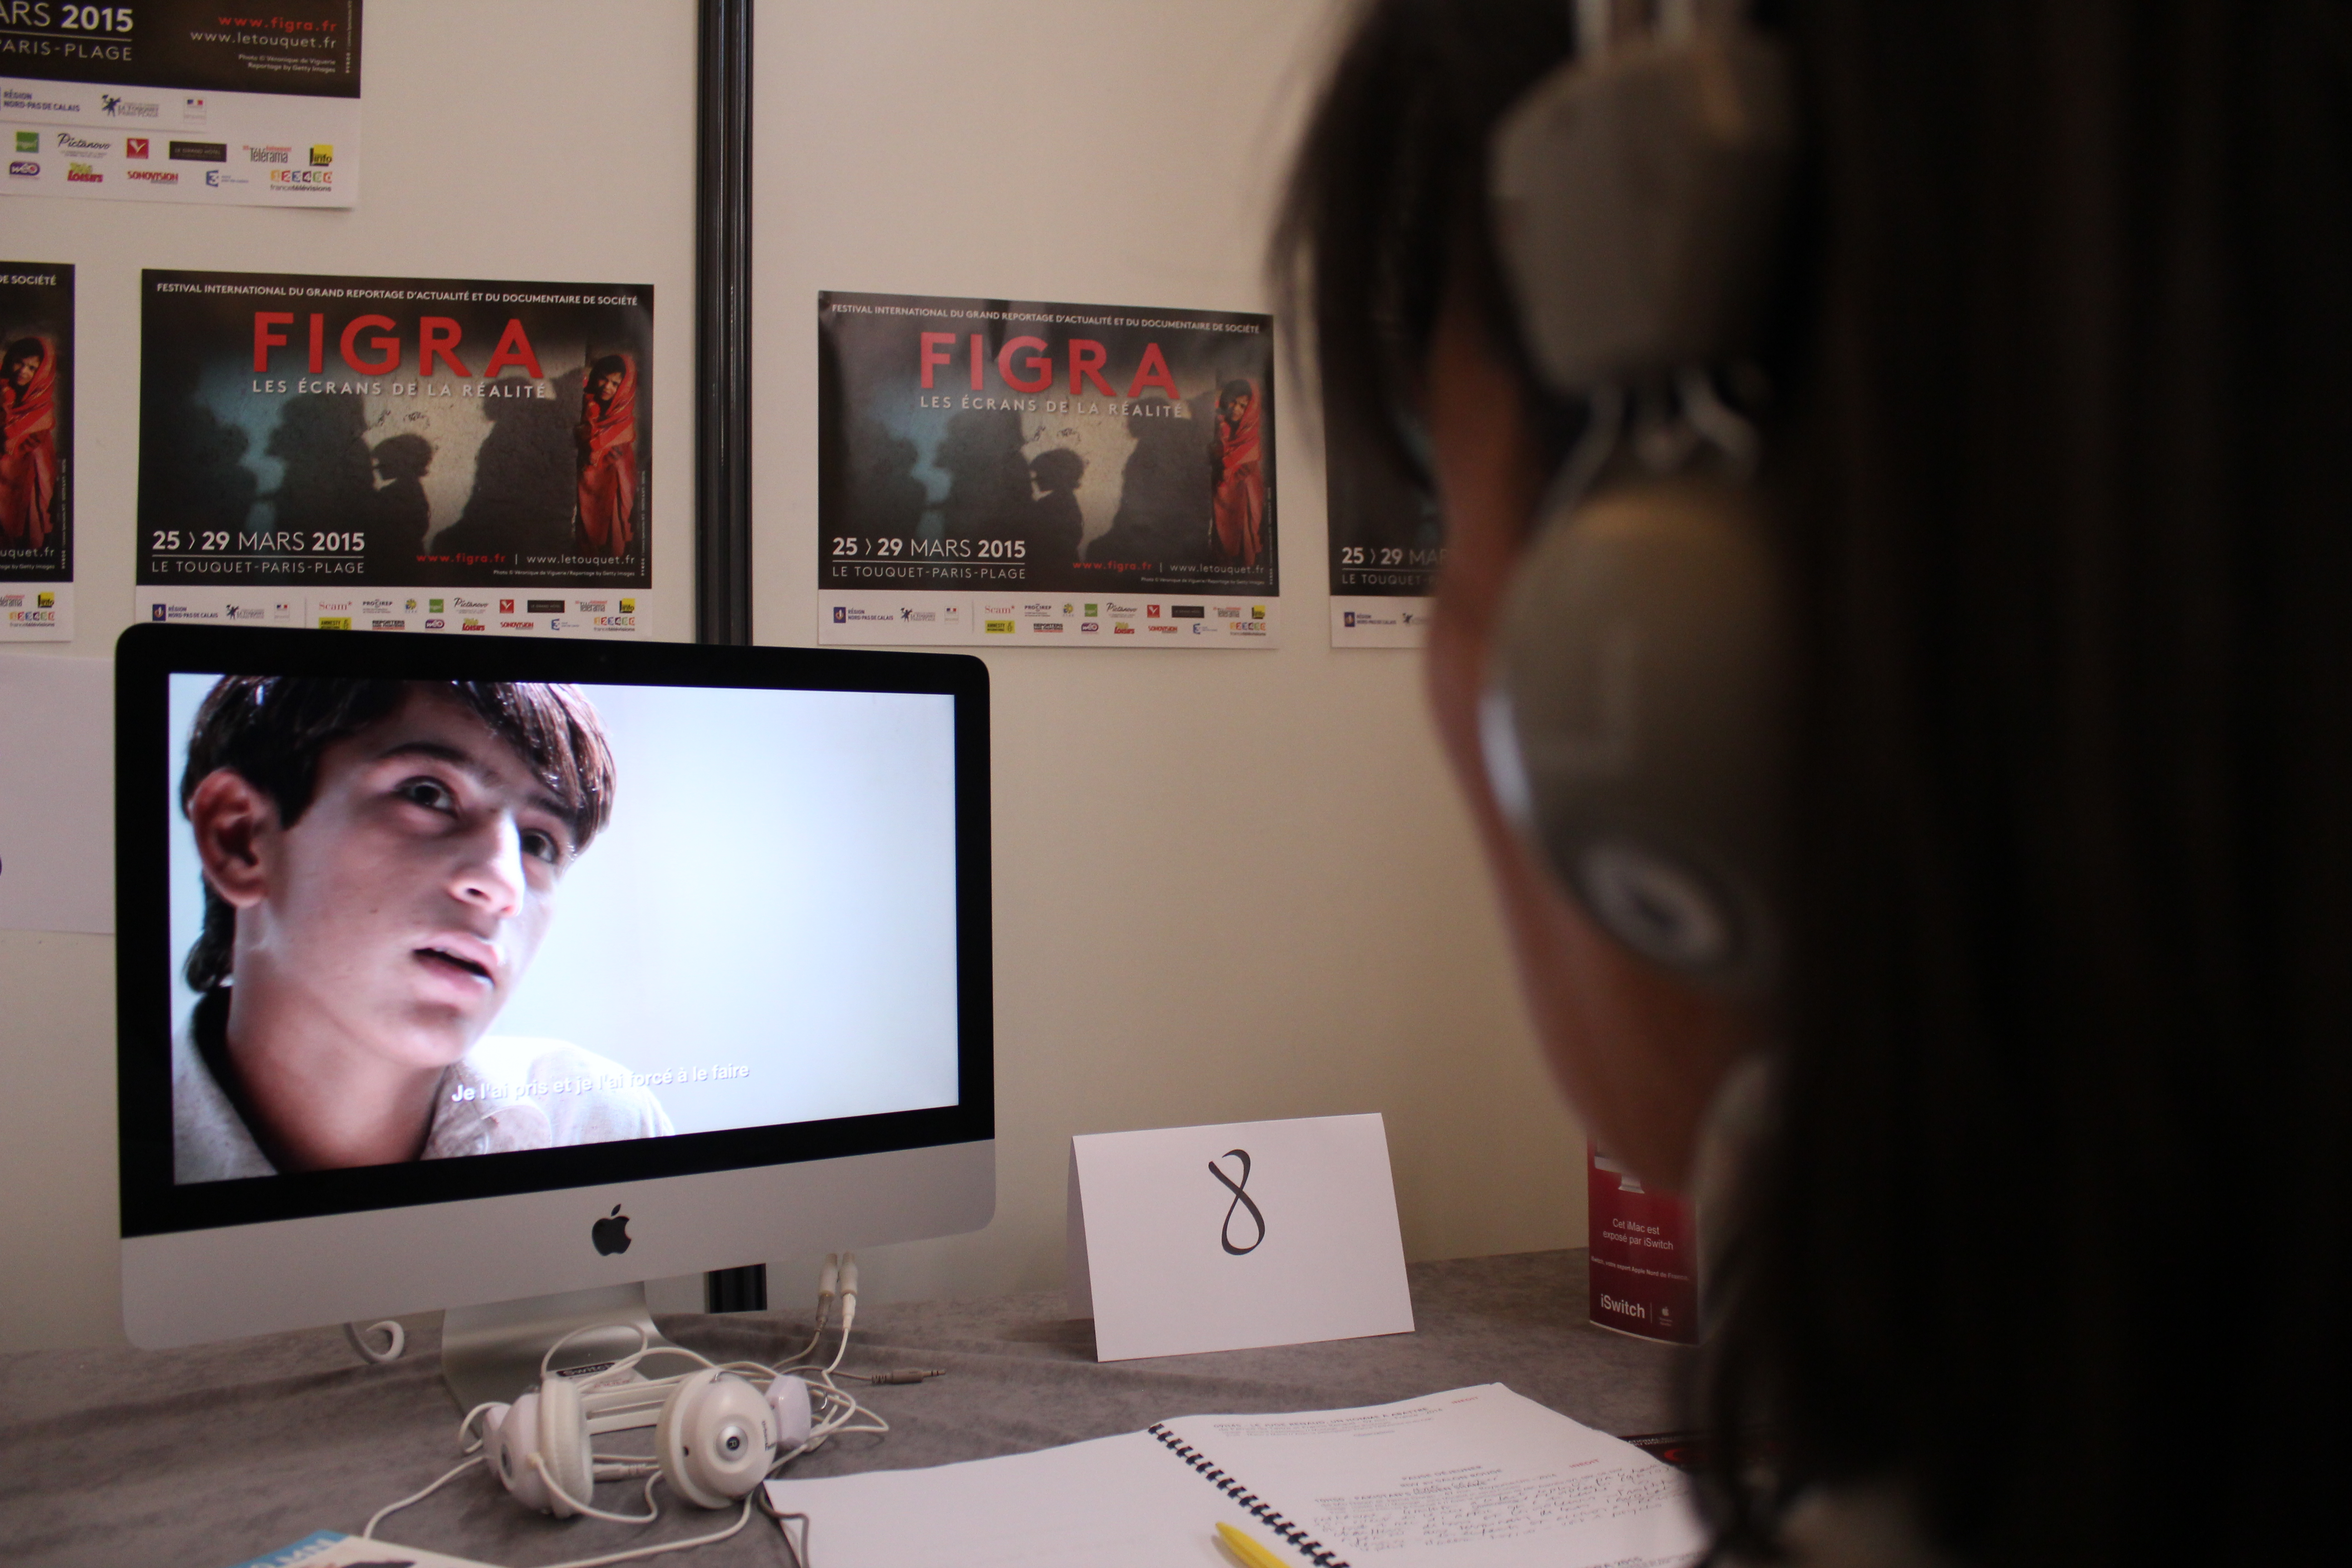 videotheque-figra-les-ecrans-de-la-realite